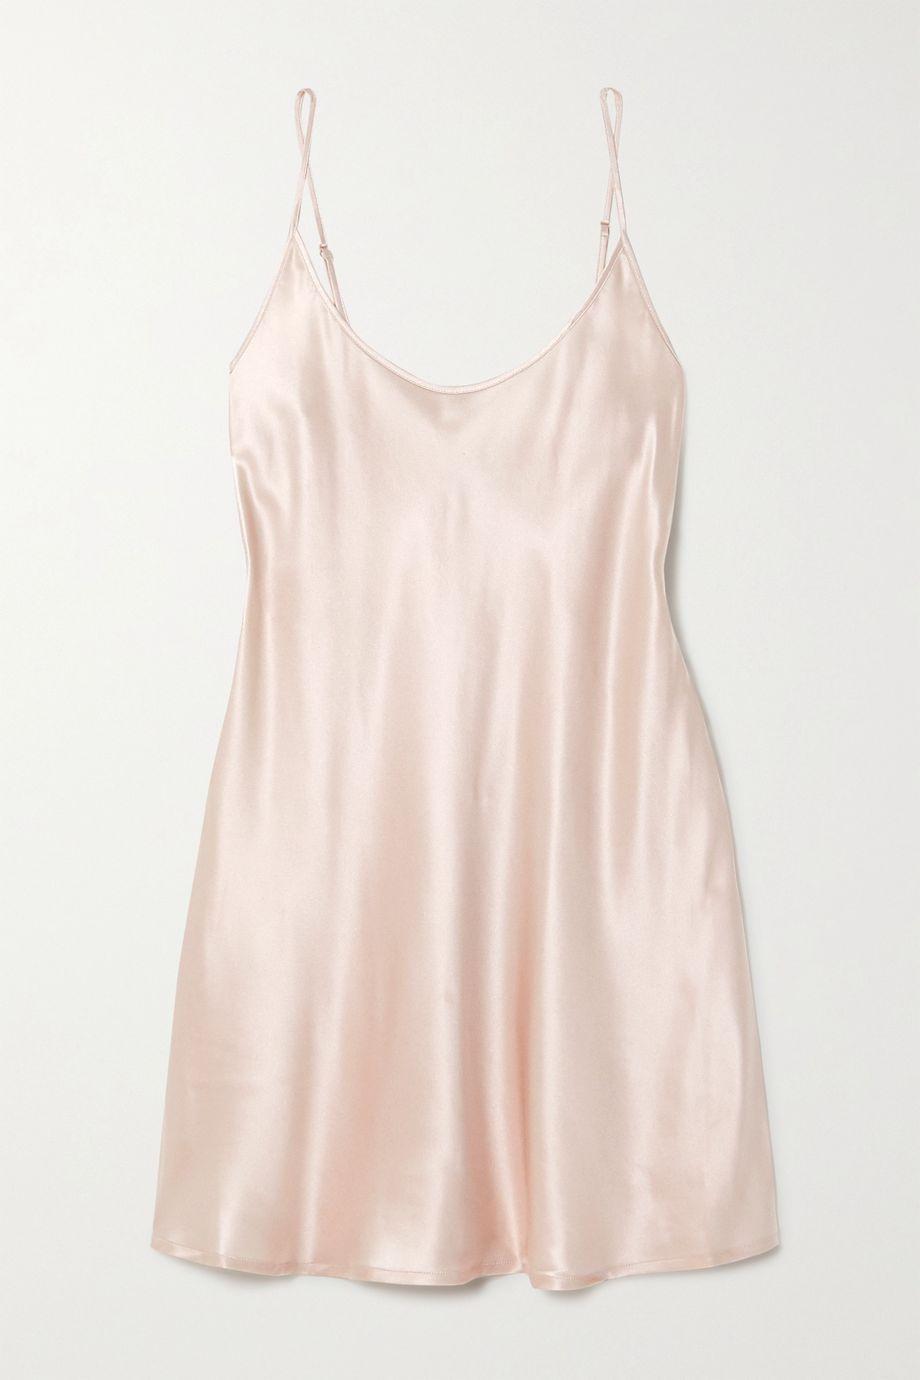 La Perla Silk-satin chemise